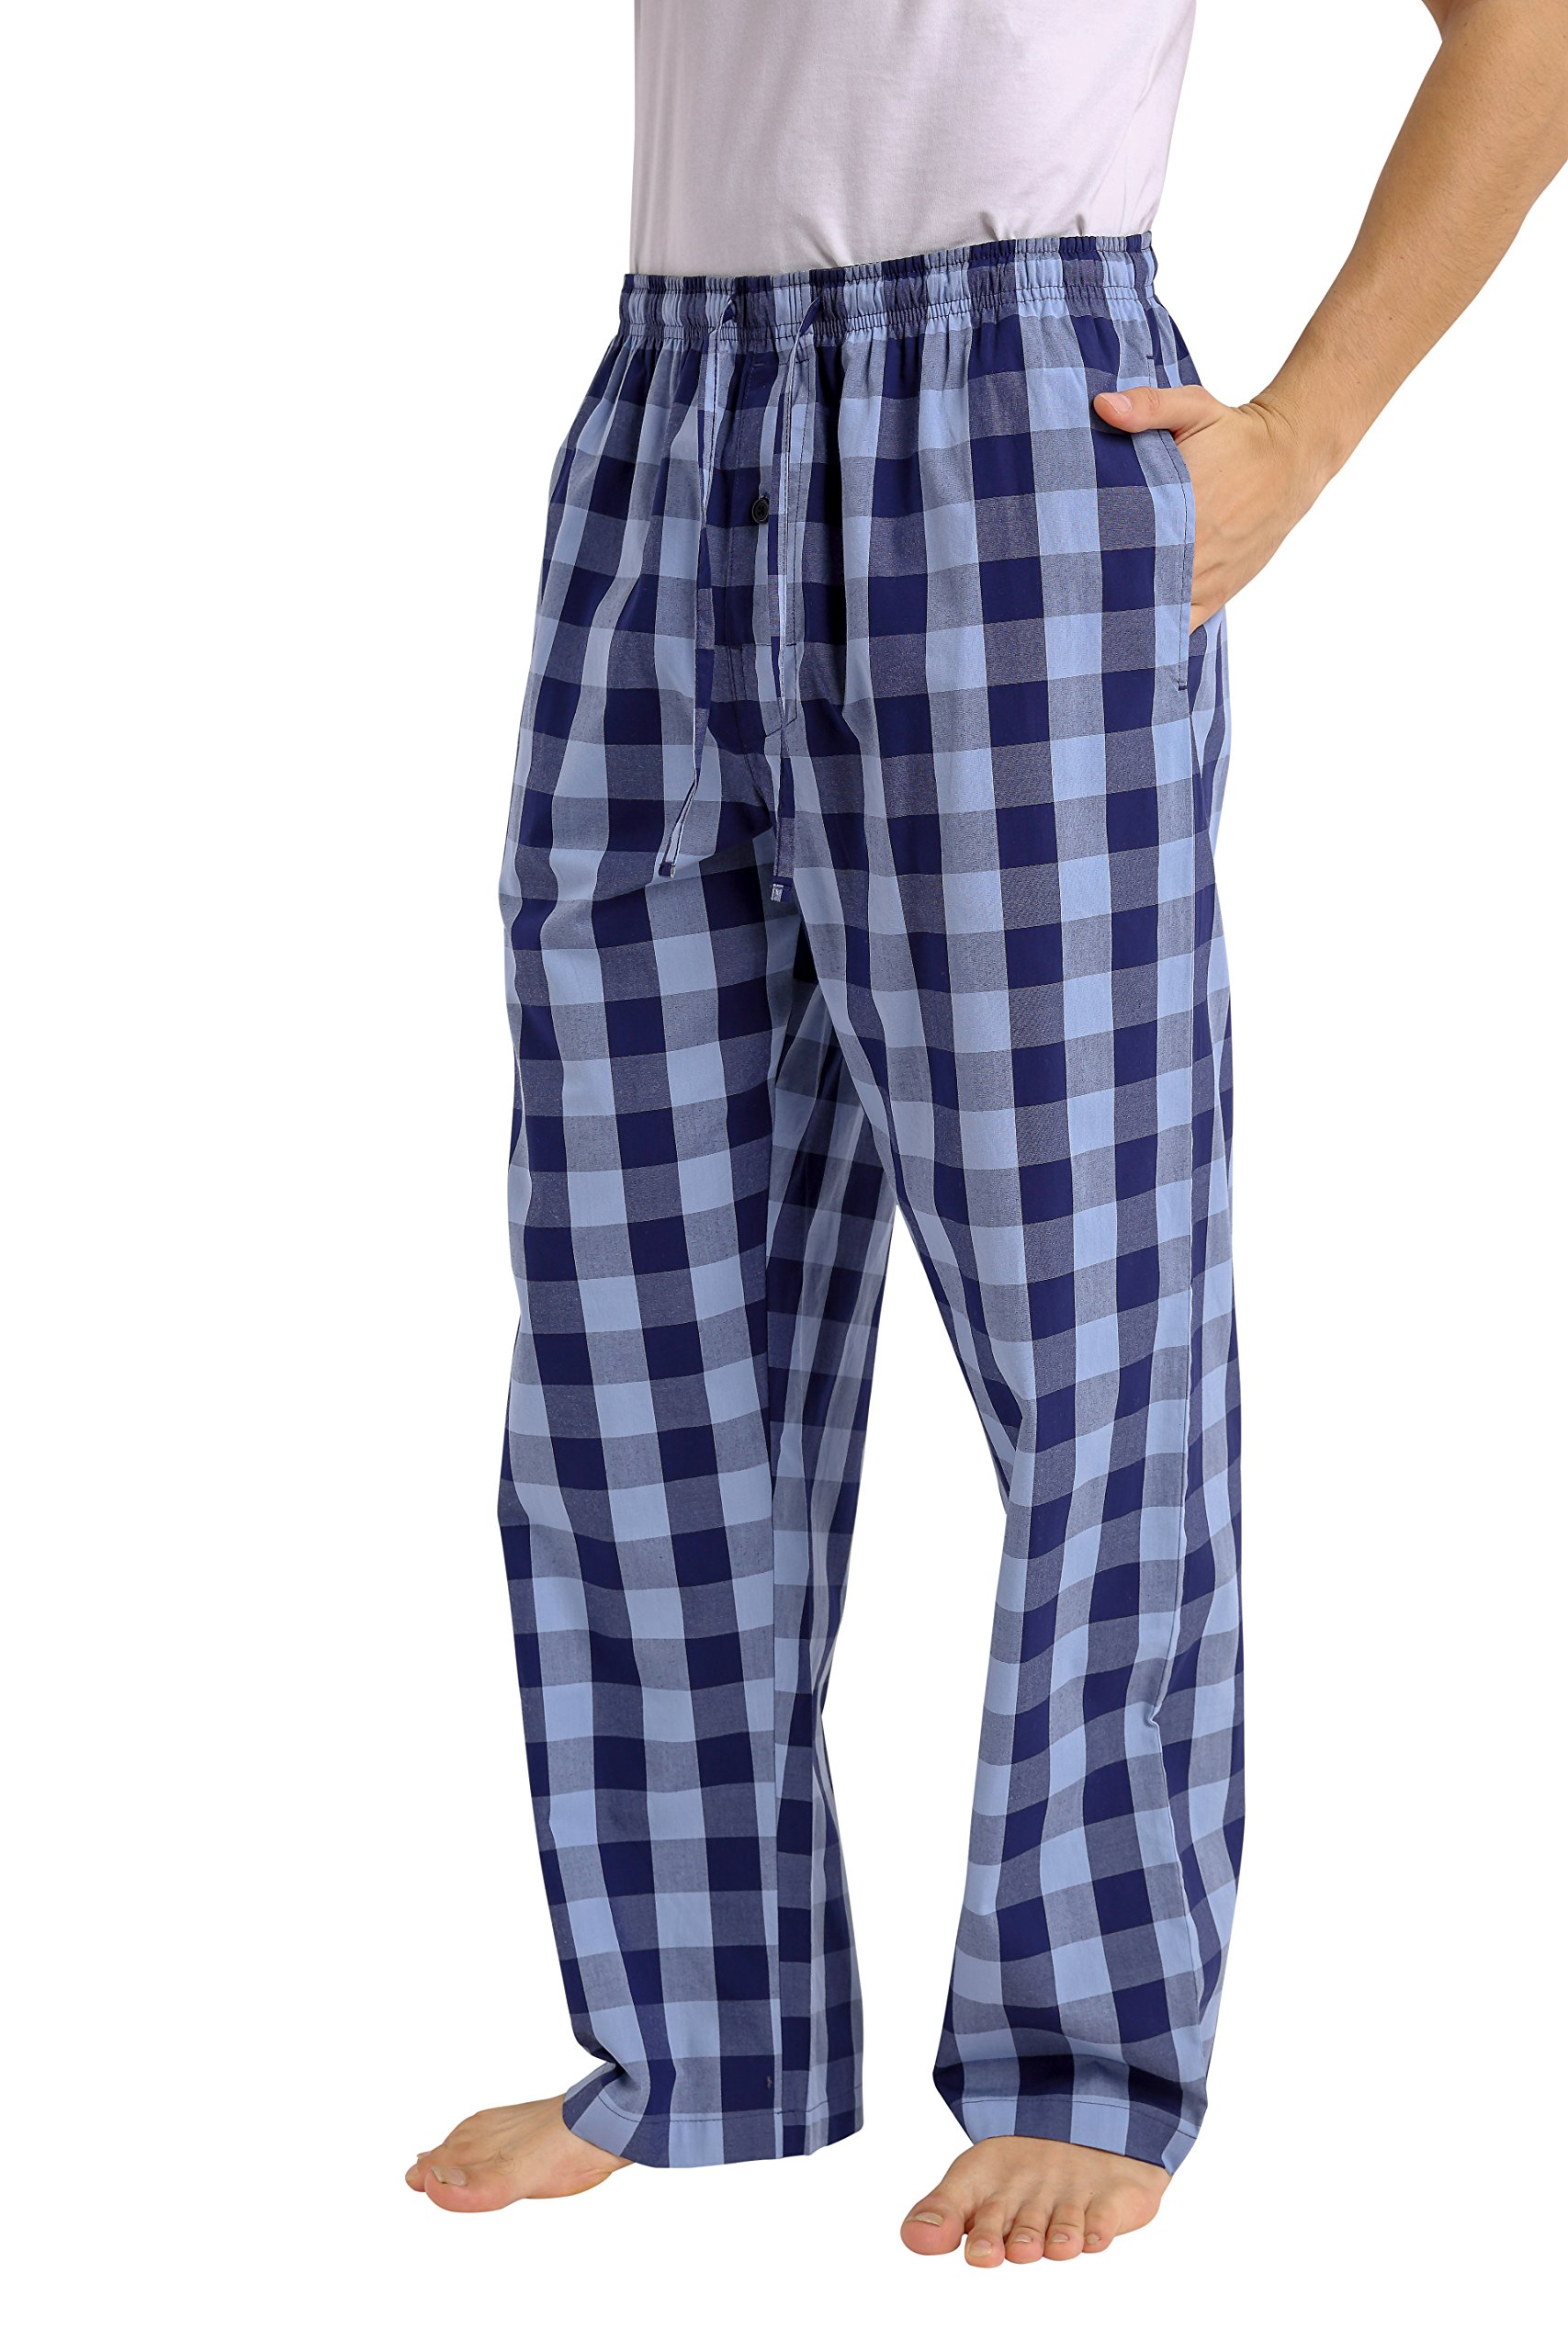 CYZ Men's 100% Cotton Poplin Pajama Lounge Sleep Pant-F1710-L by CYZ Collection